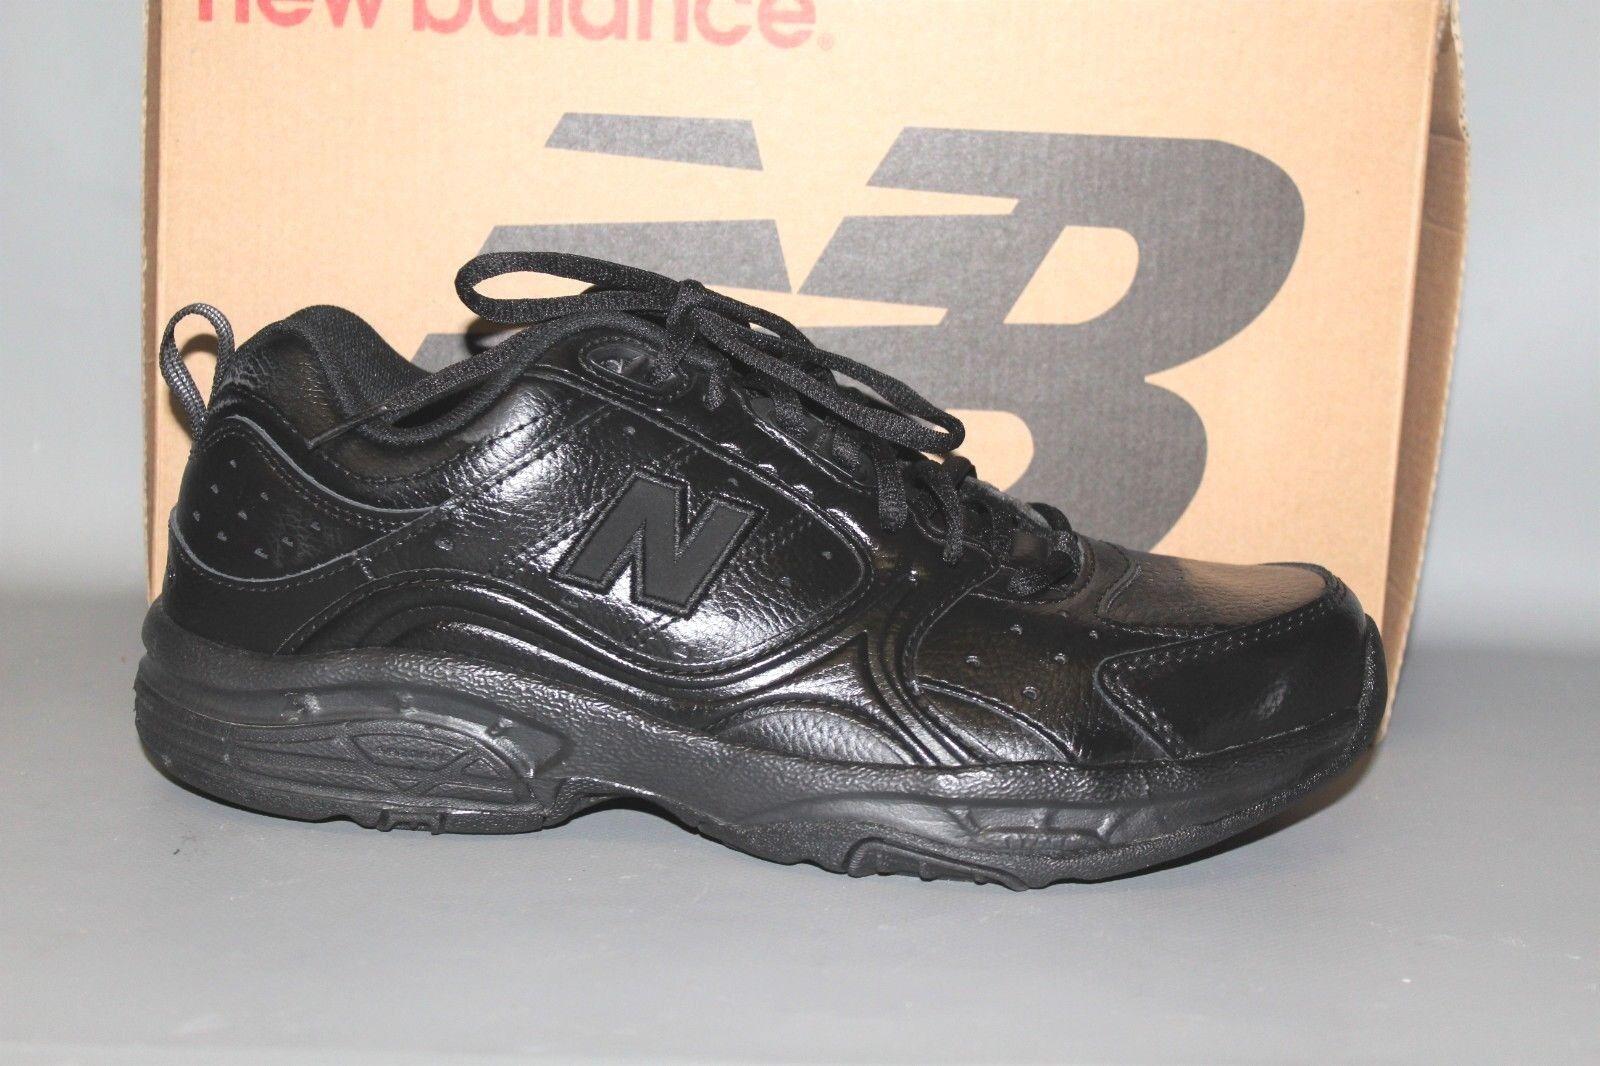 7372075493 NEW New Balance MX622 AB Size 11.5 D Black Athletic Training shoes Men's  nobiyx5304-new shoes